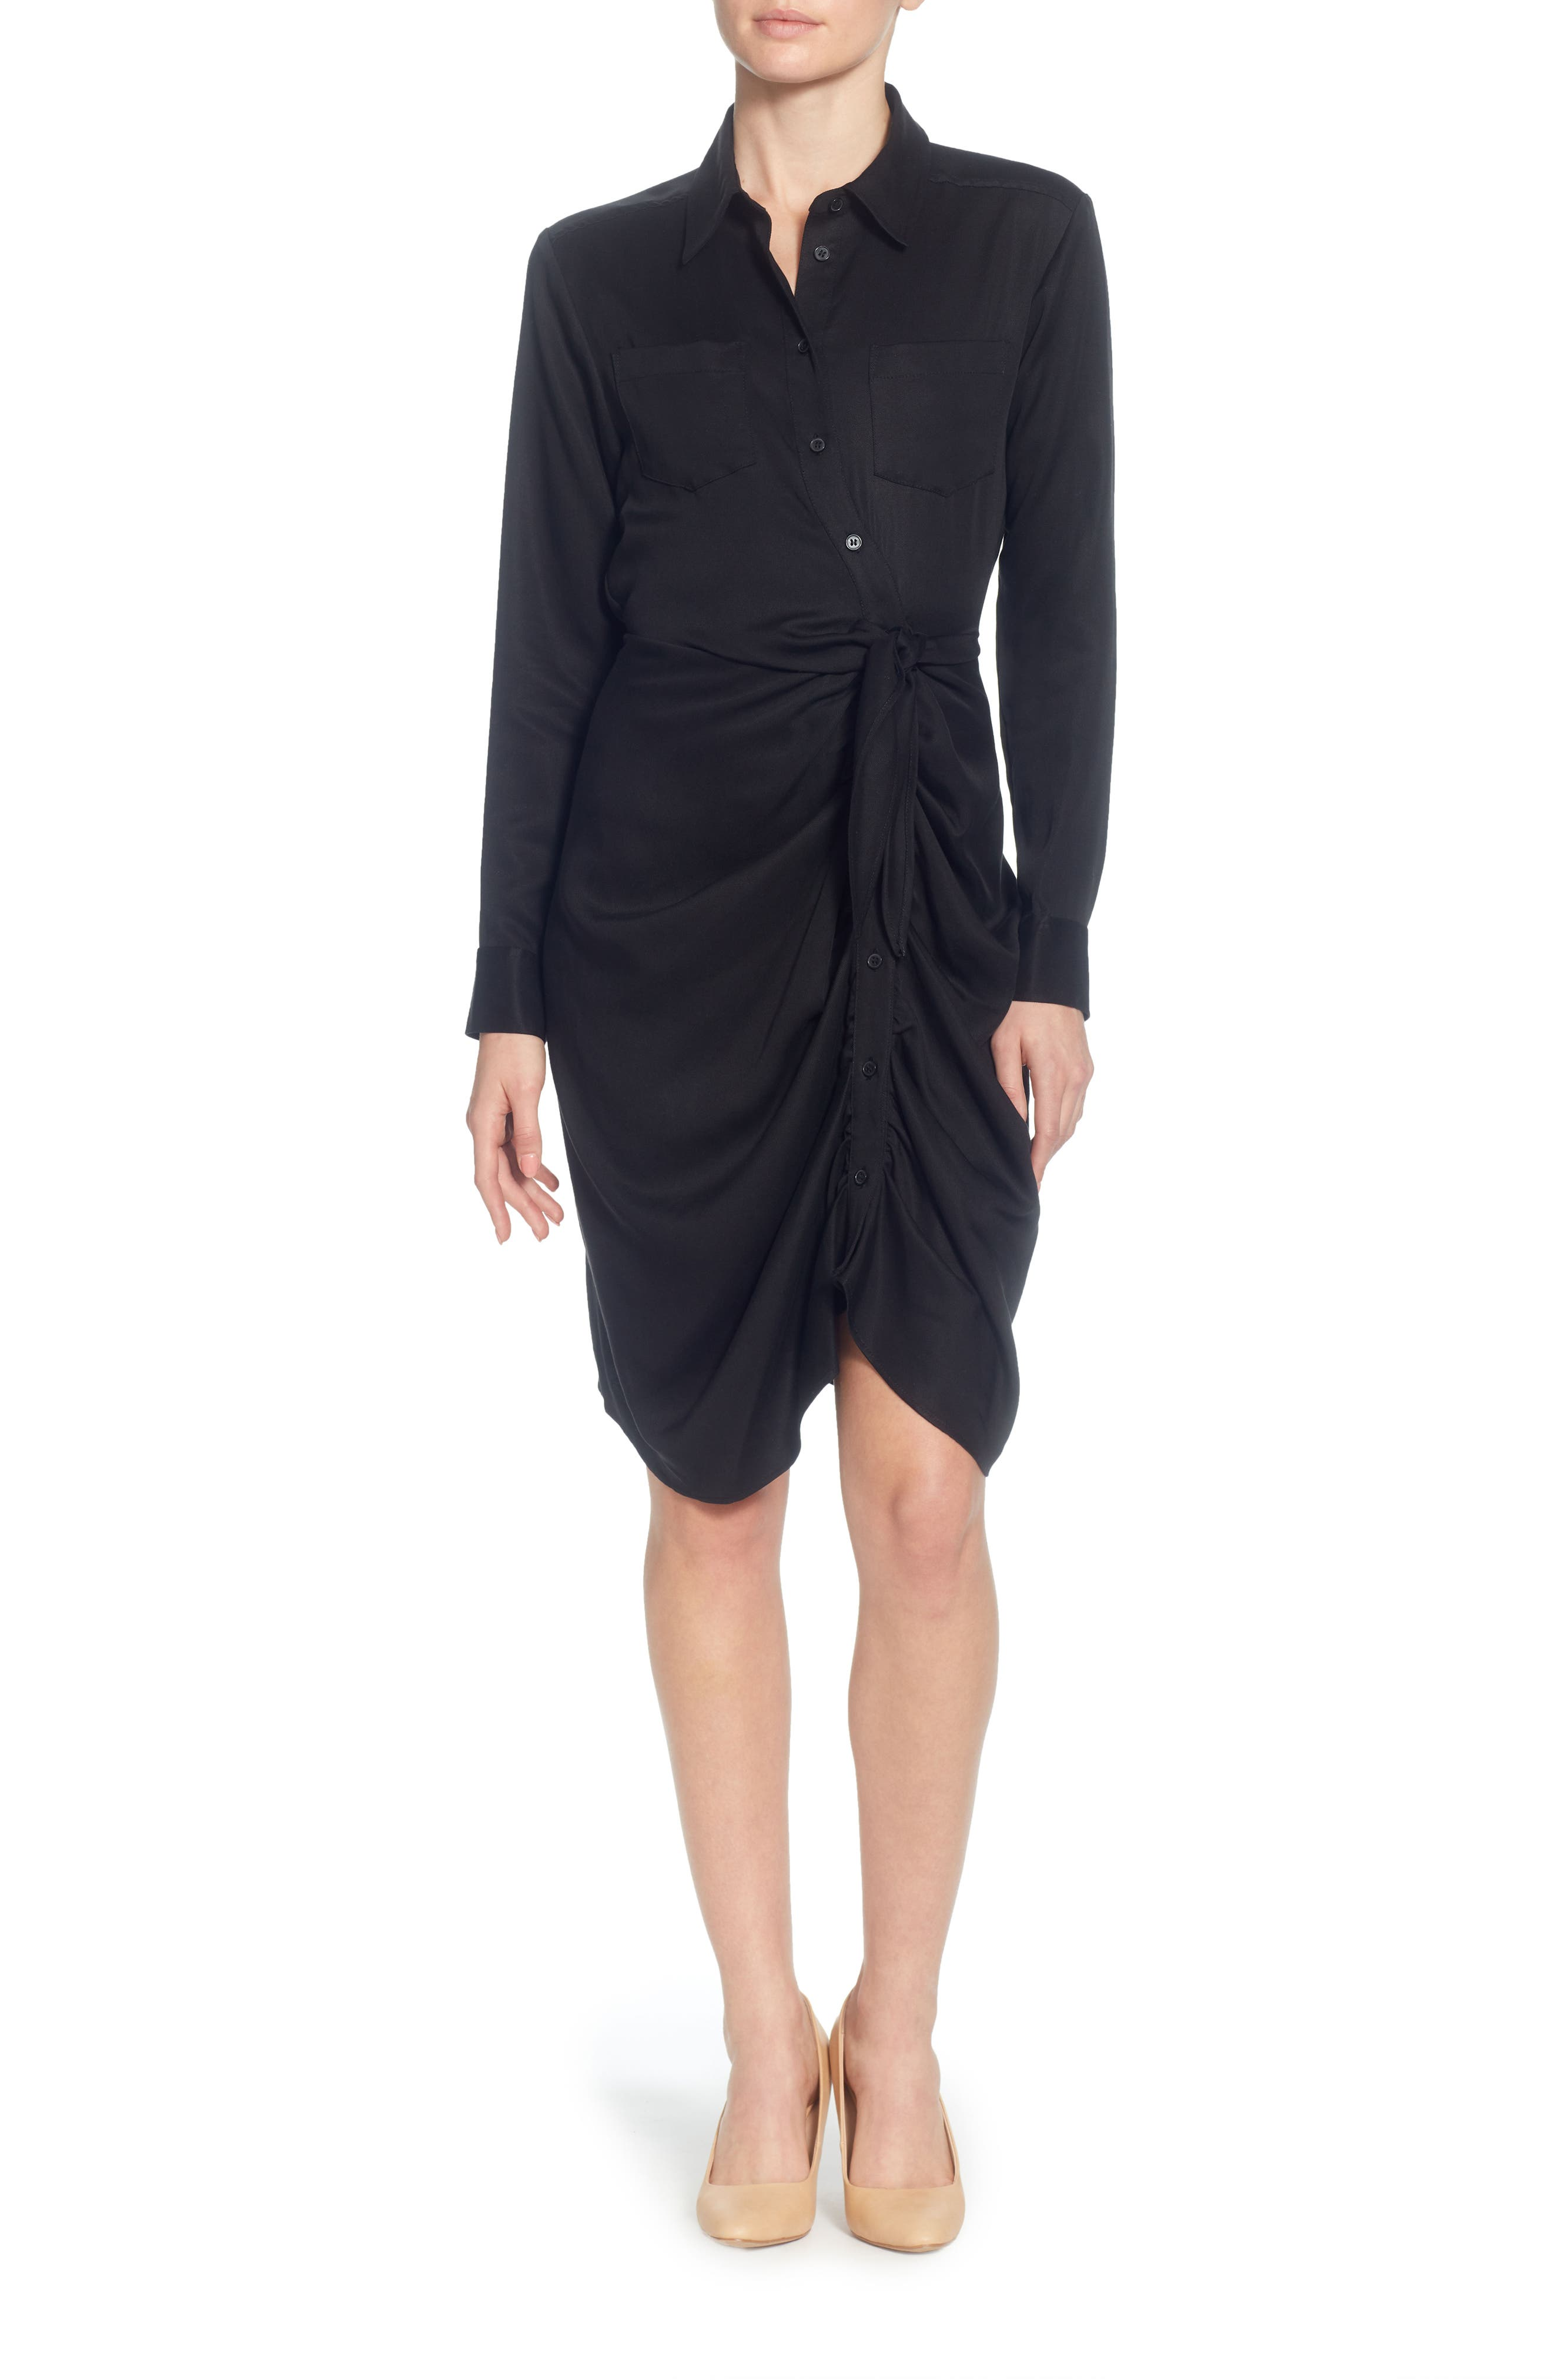 Alternate Image 1 Selected - Catherine Catherine Malandrino Sloan Tie-Waist Dress